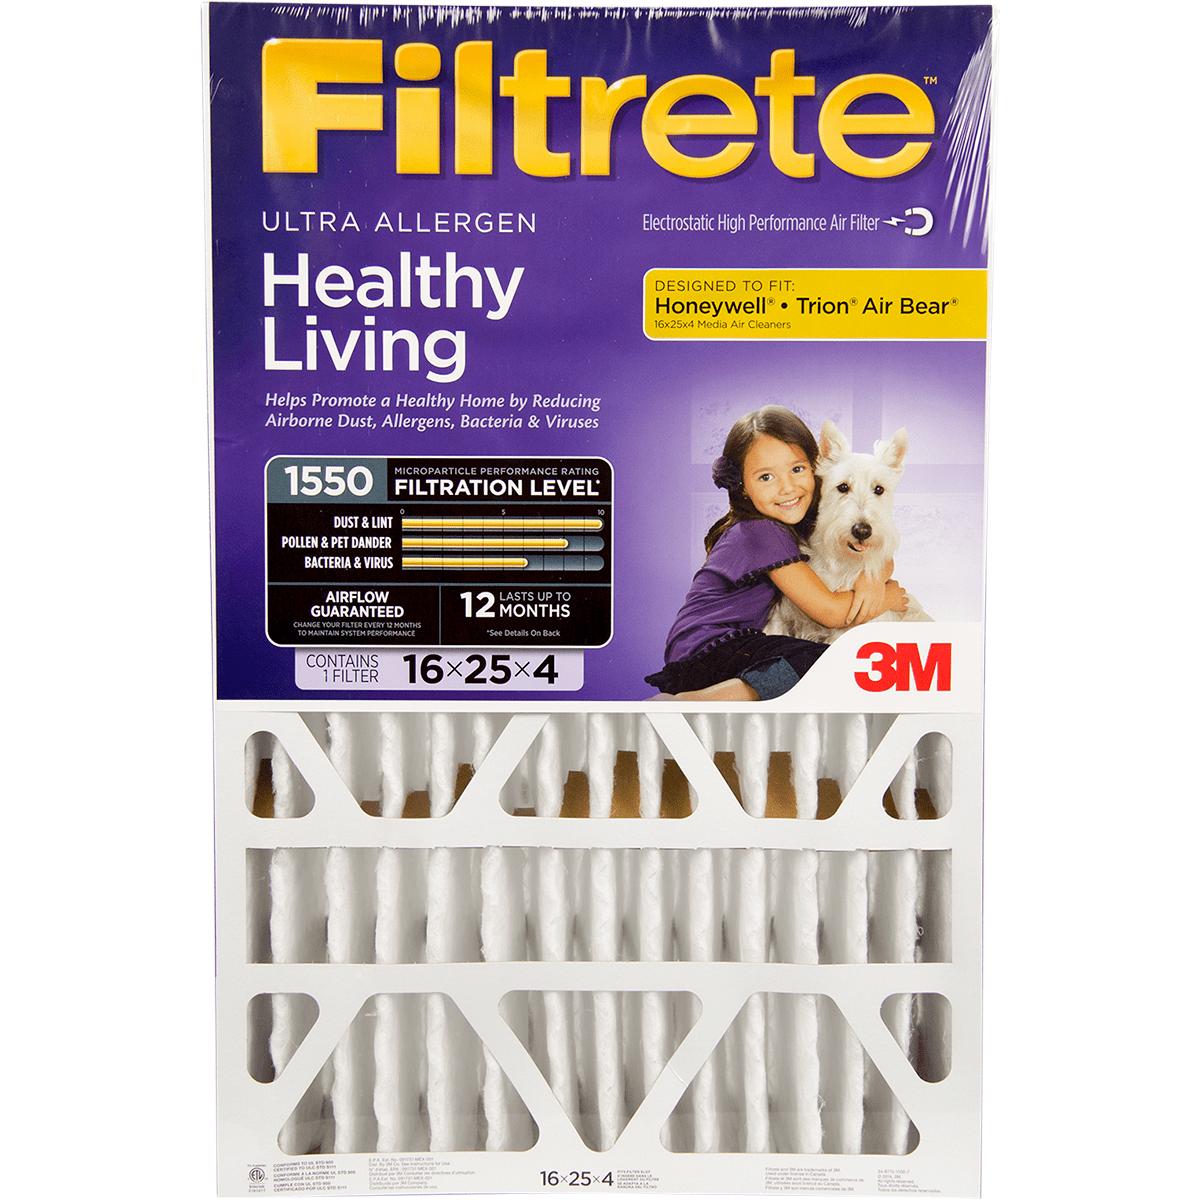 3m Filtrete Healthy Living 1550 Mpr 4-inch Ultra Allergen Reduction Filter